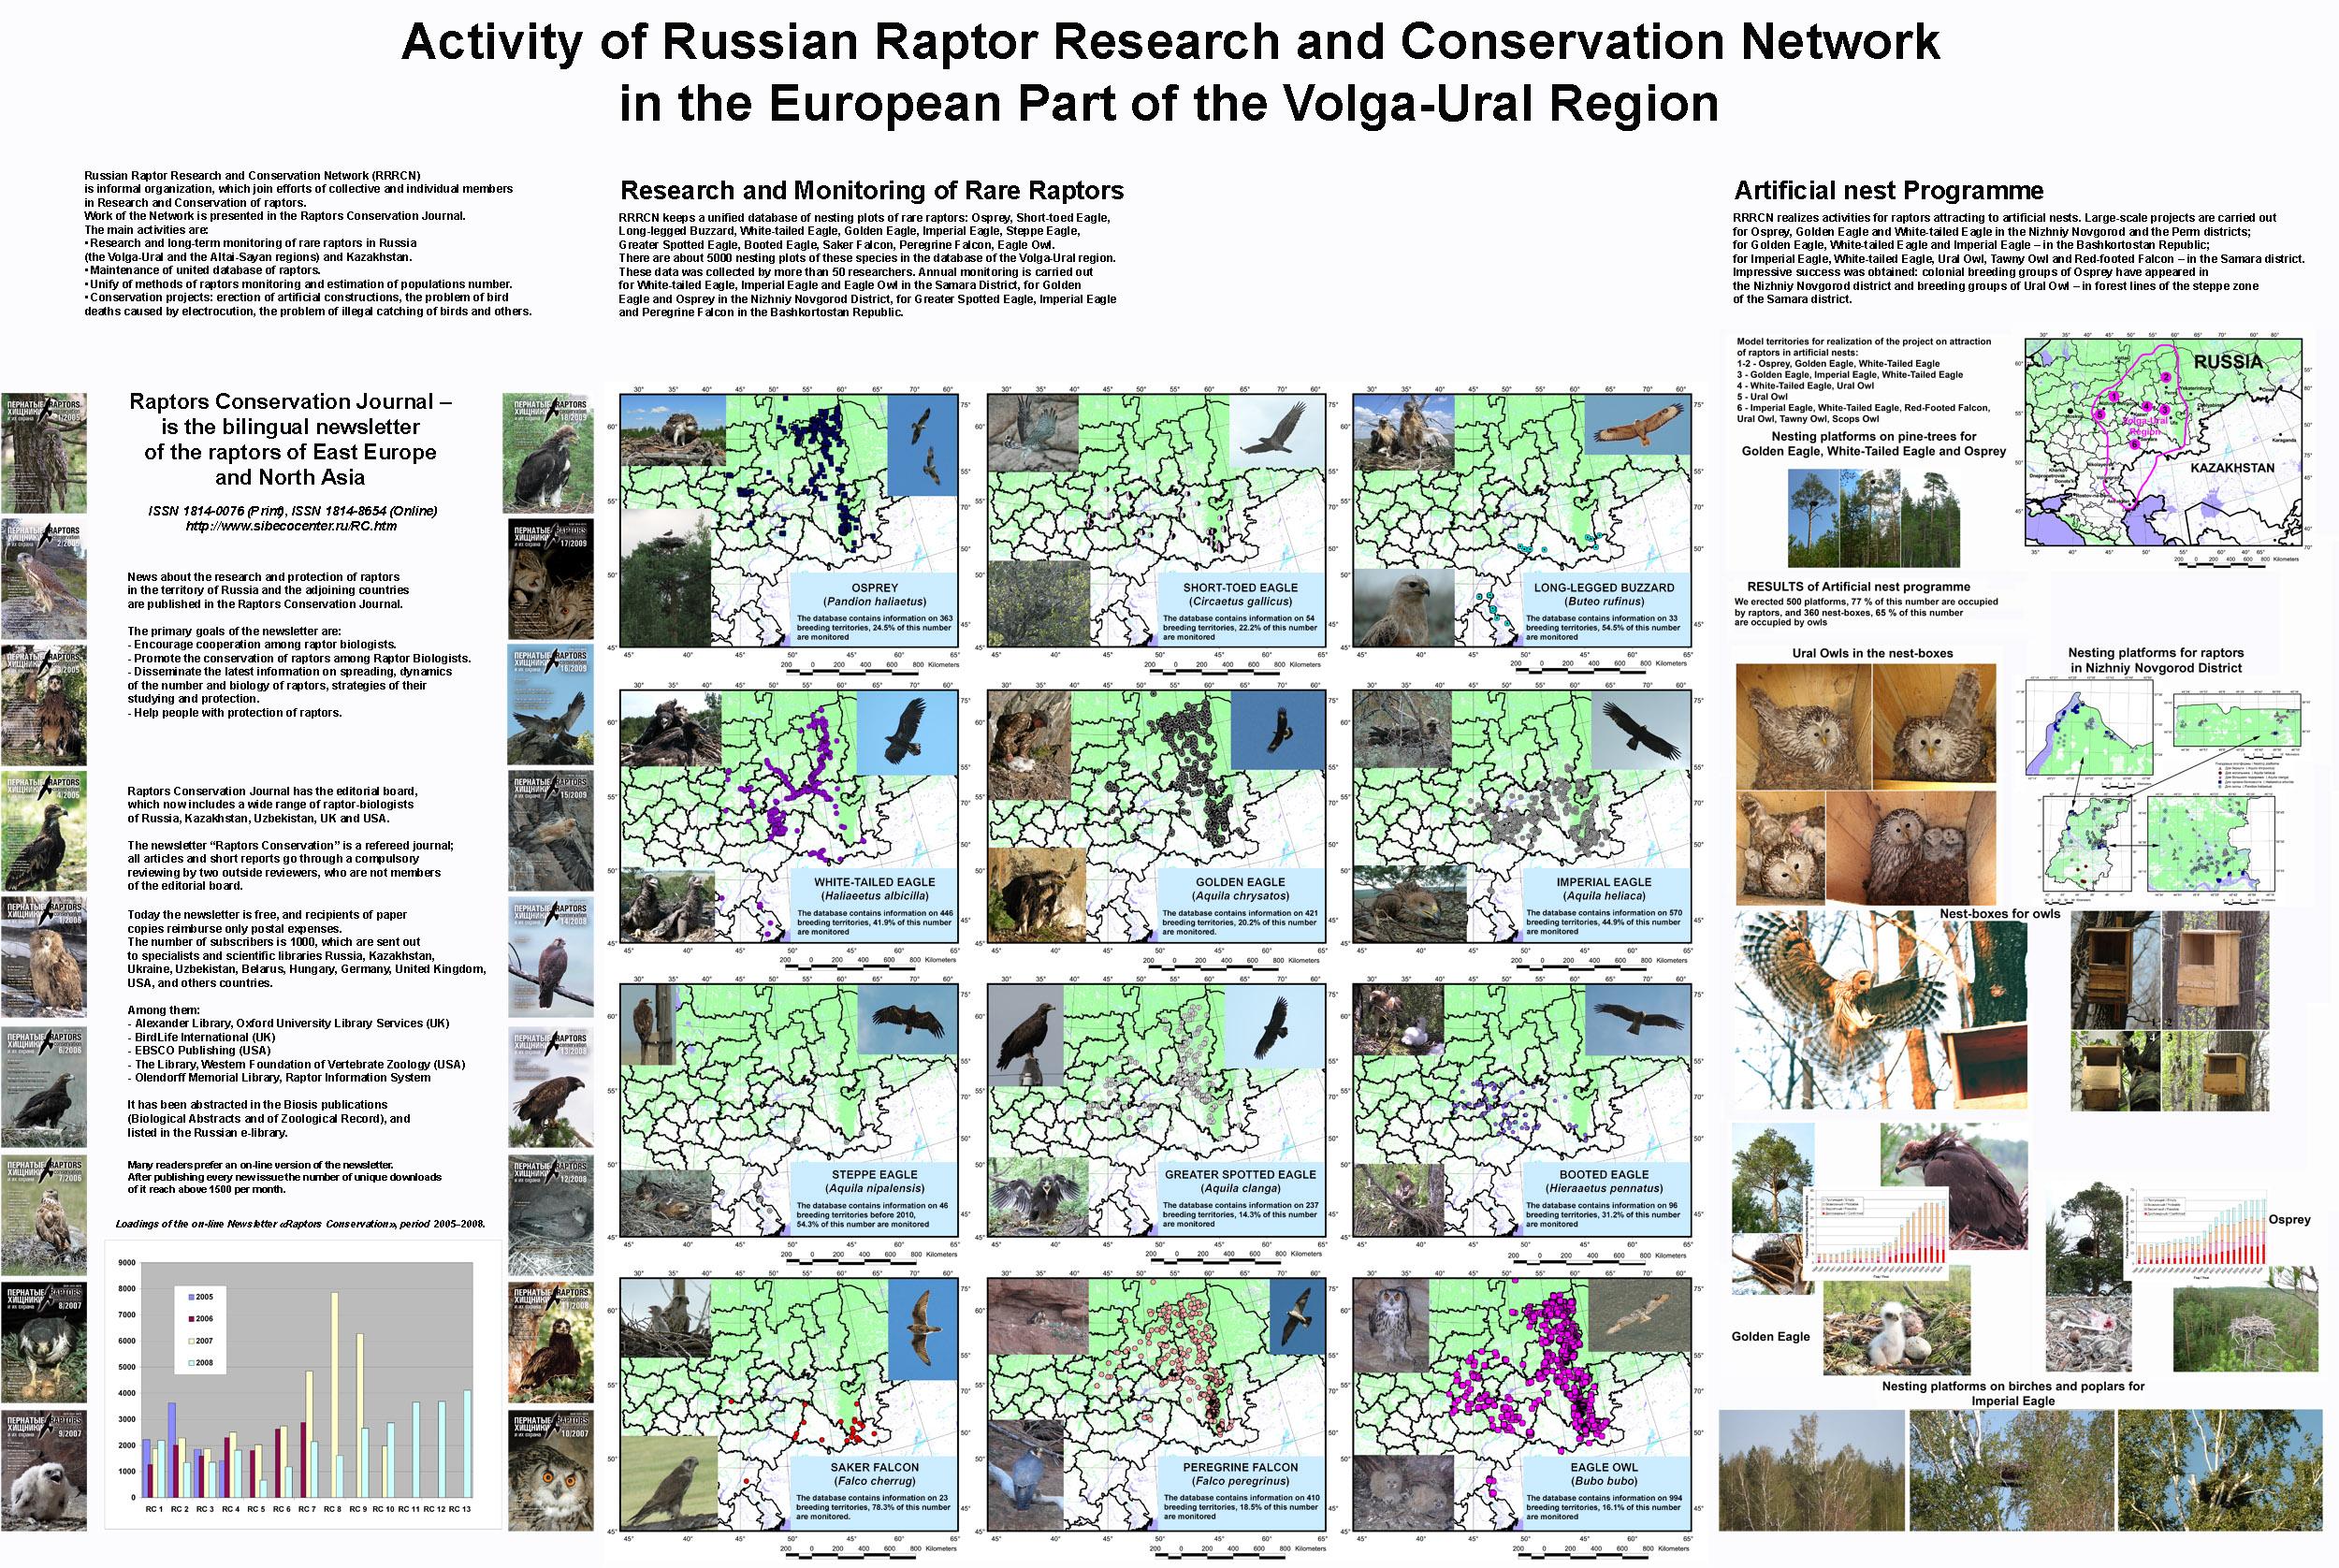 Активности RRRCN в ВУР